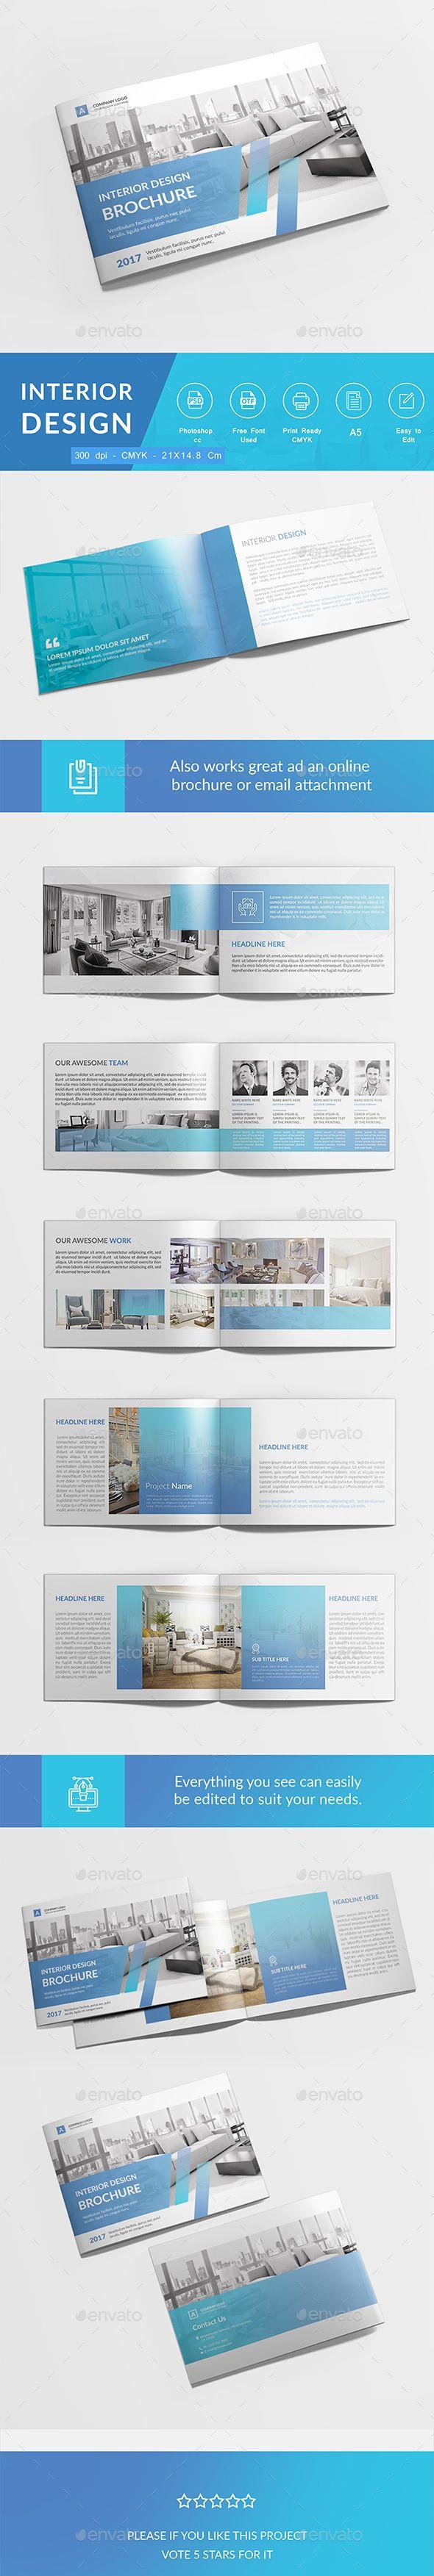 Interior Brochure Design Template PSD                                                                                                                                                                                 More